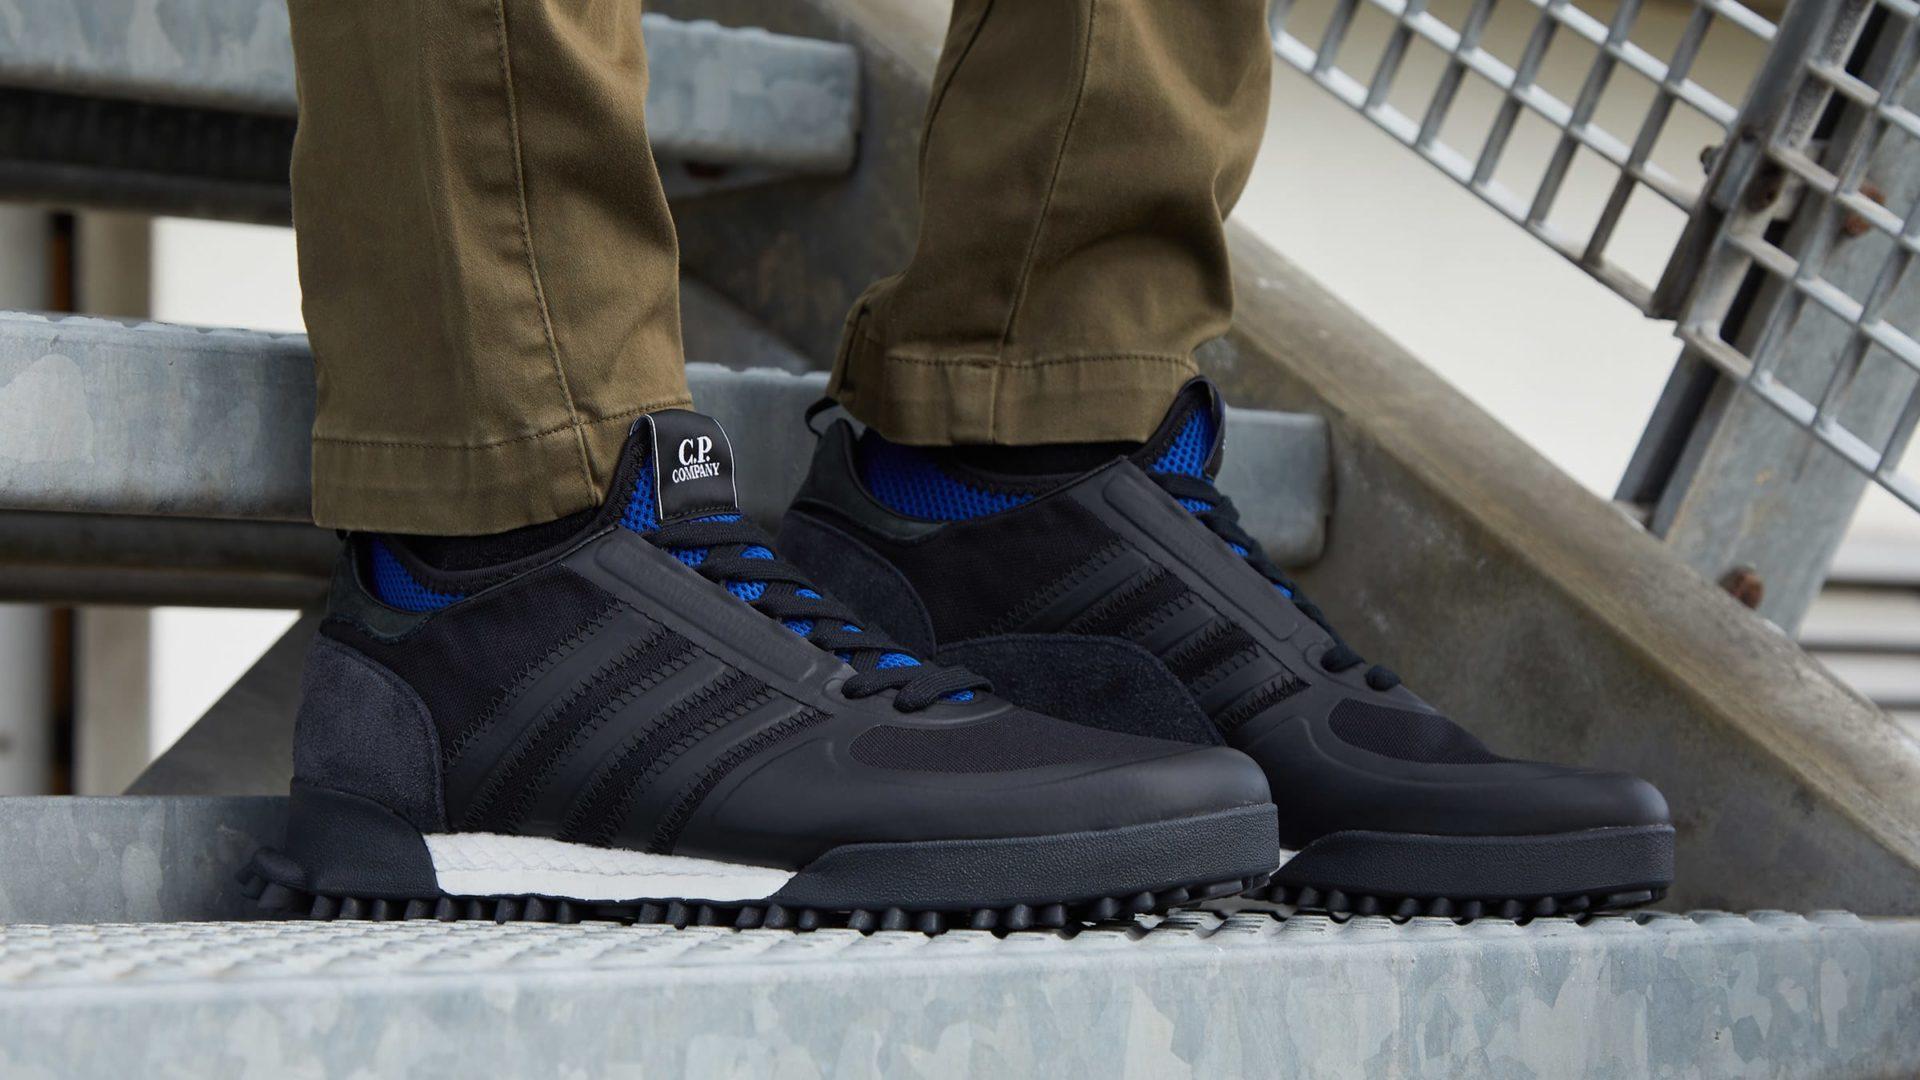 best sneakers 919a0 00b68 ADIDAS X C.P. COMPANY MARATHON - Sapeur - One Step Beyond ...